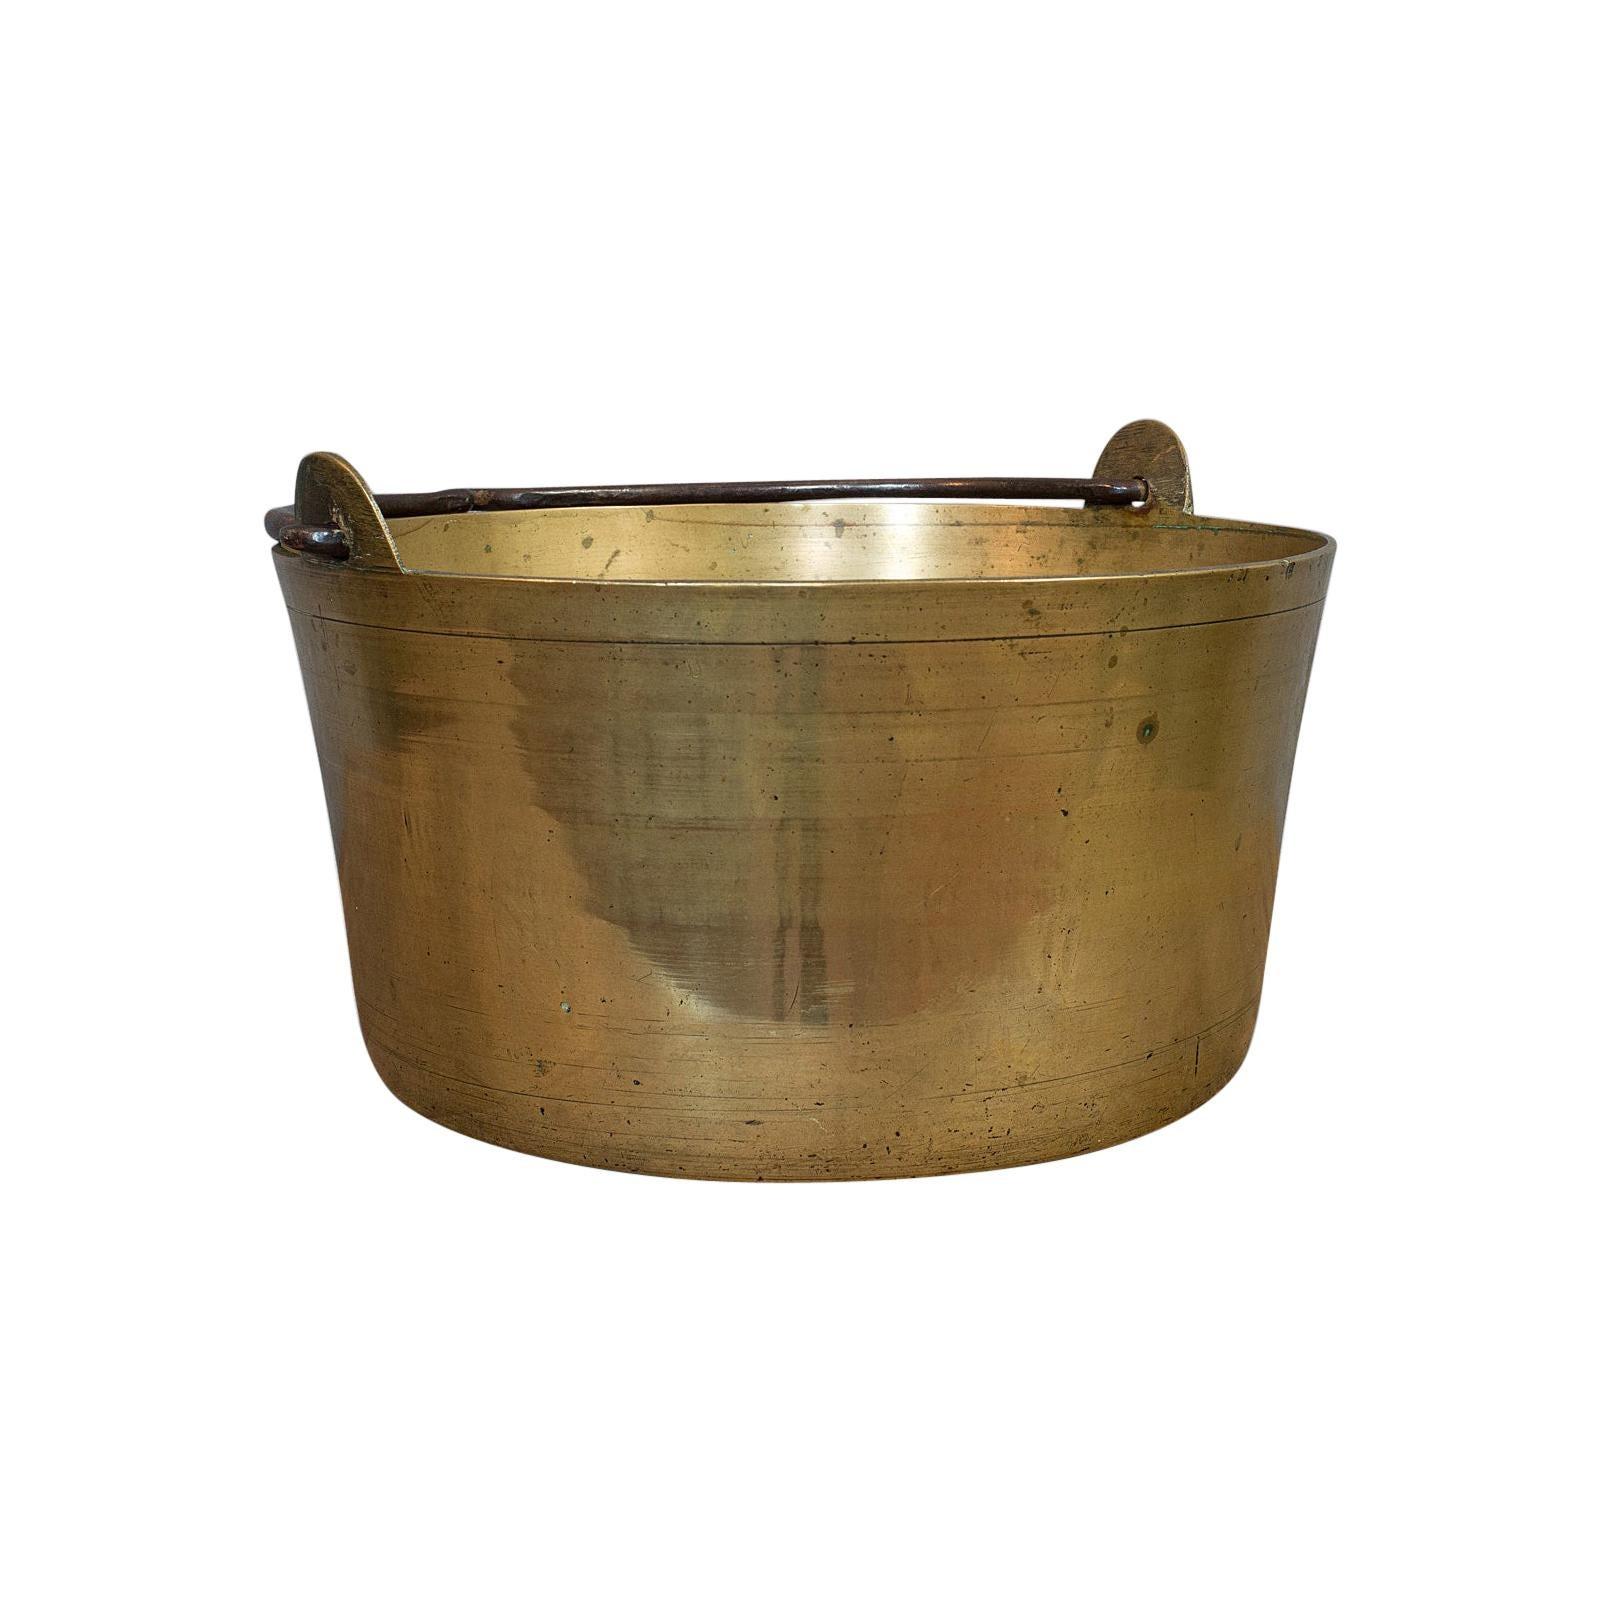 Antique Artisan Jam Pan, French, Solid Brass, Kitchen Pot, Victorian, circa 1900